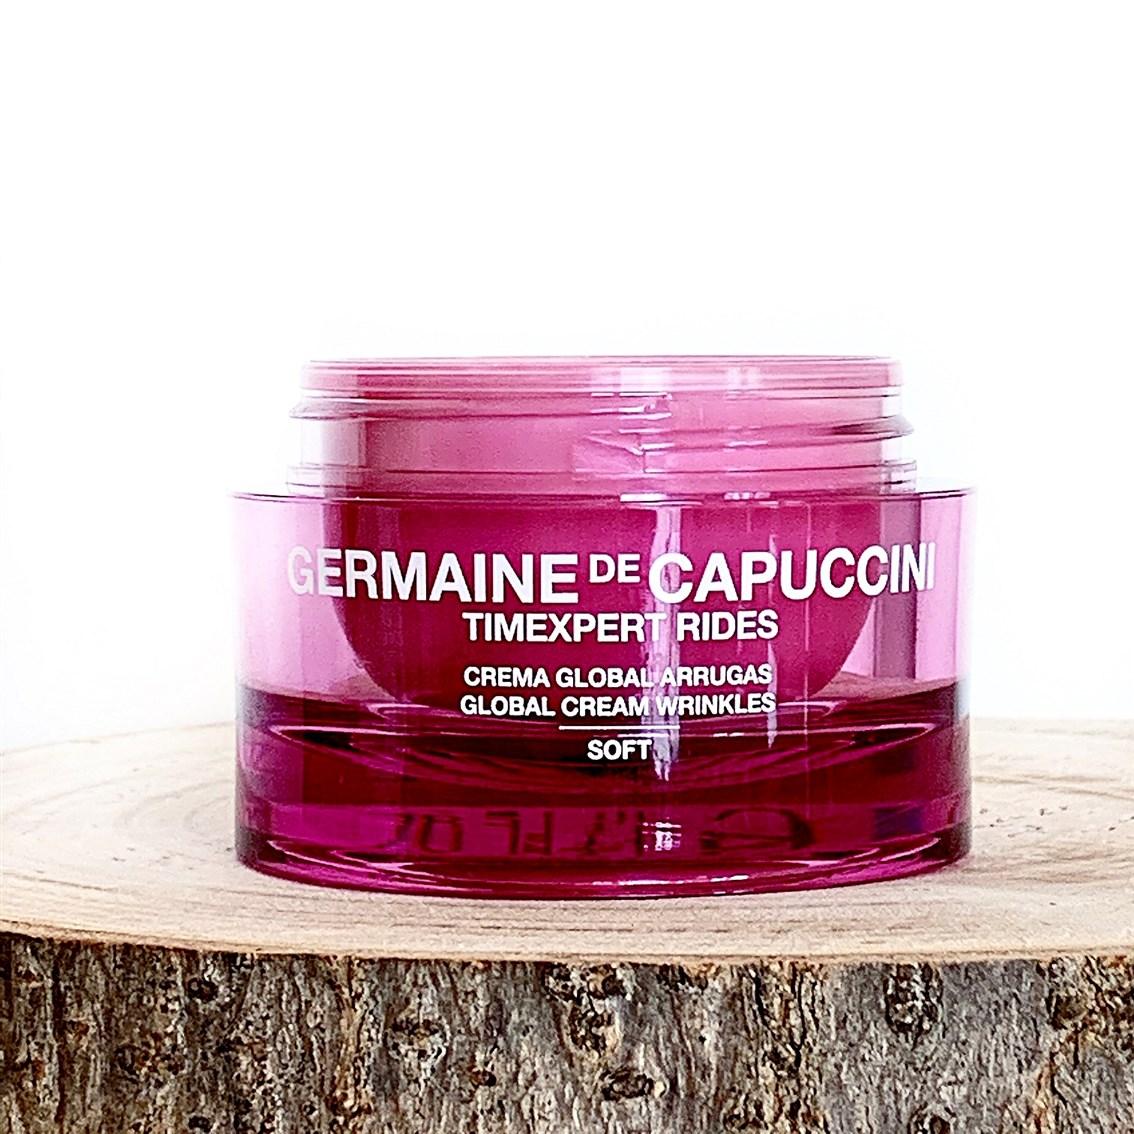 Germaine de Capuccini kosmetyki